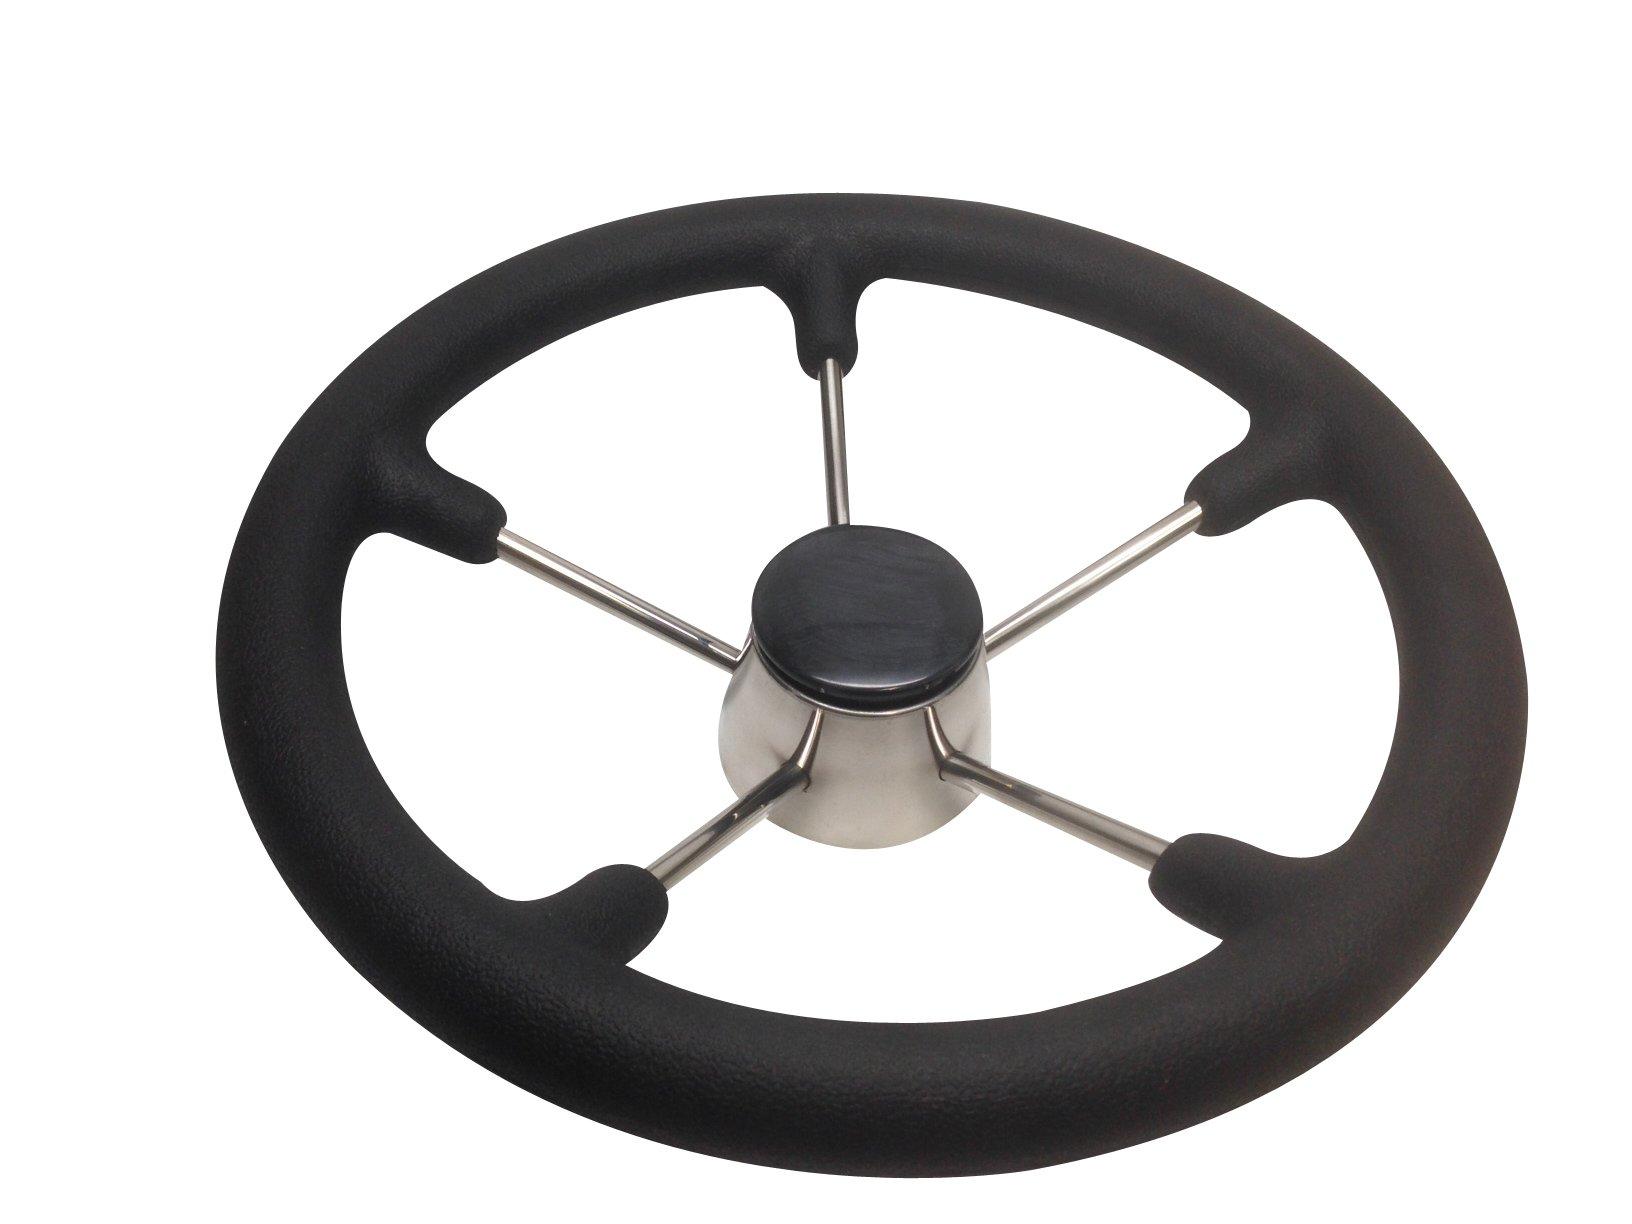 NEW Boat Steering Wheel Rib Speedboat Cruiser GREY PU Soft Grip Spoked Stainless